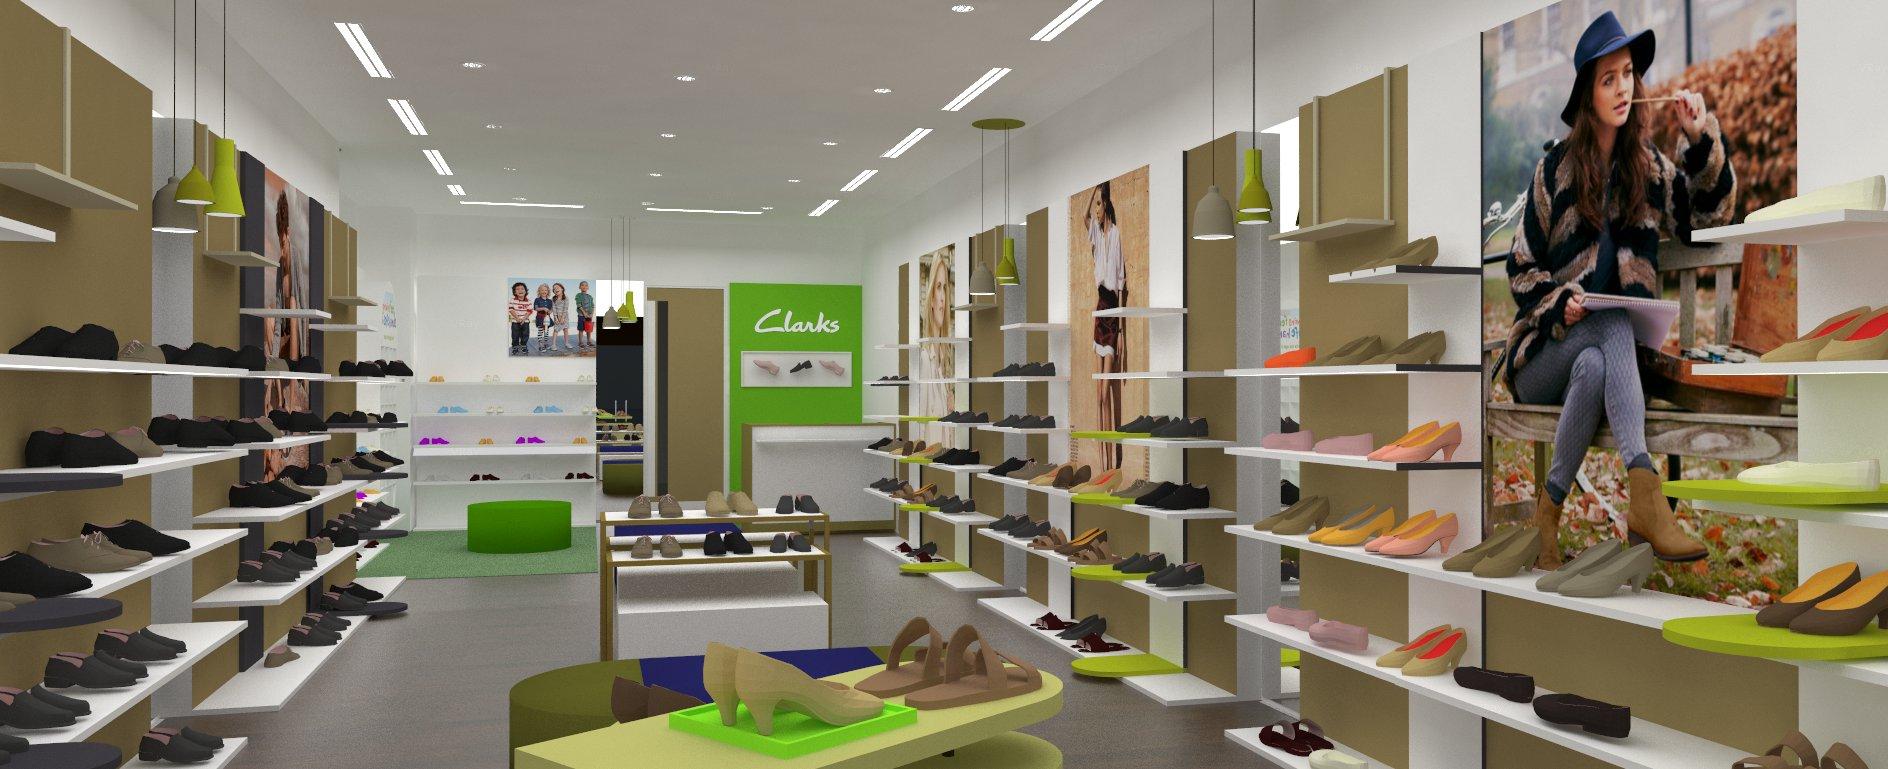 5e888e12 Coming Soon: Clarks C7 @ Sunway Putra Mall, Kuala Lumpur